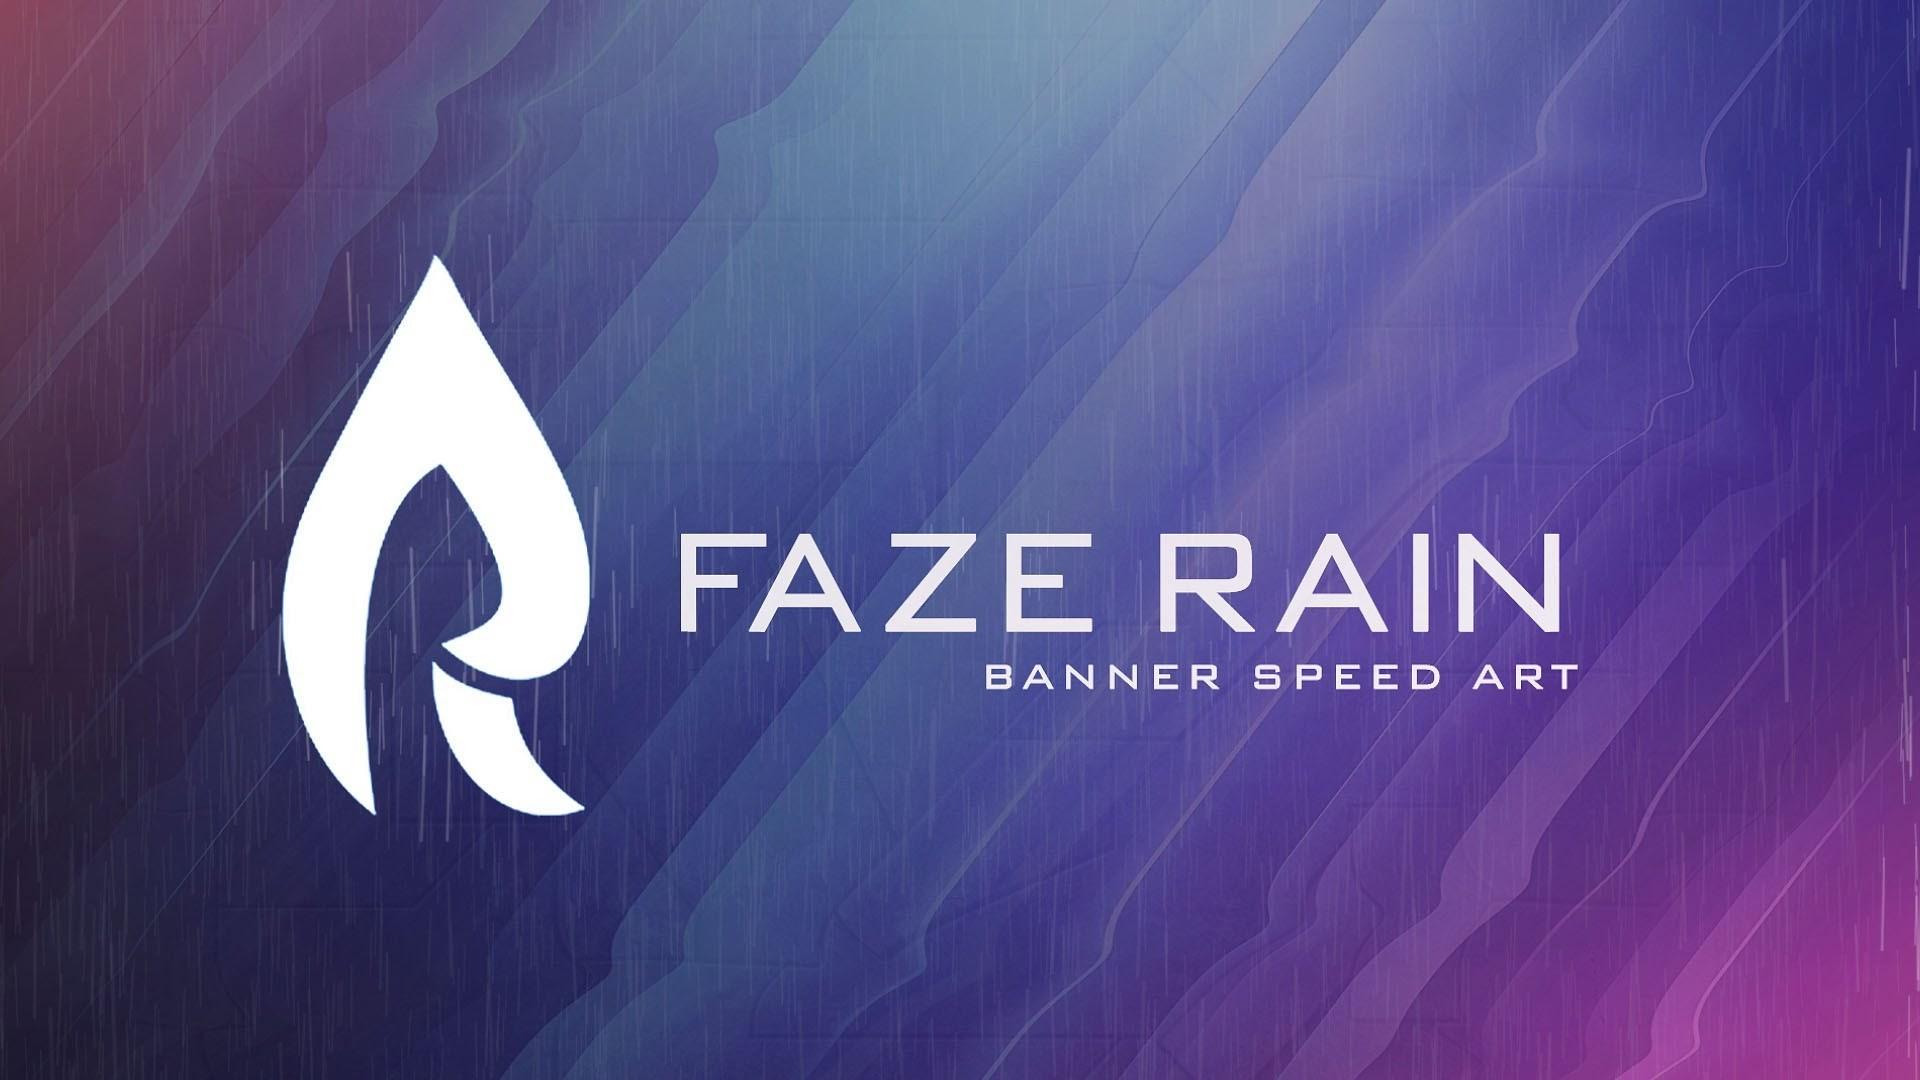 FaZe Clan 1080p Wallpaper – WallpaperSafari